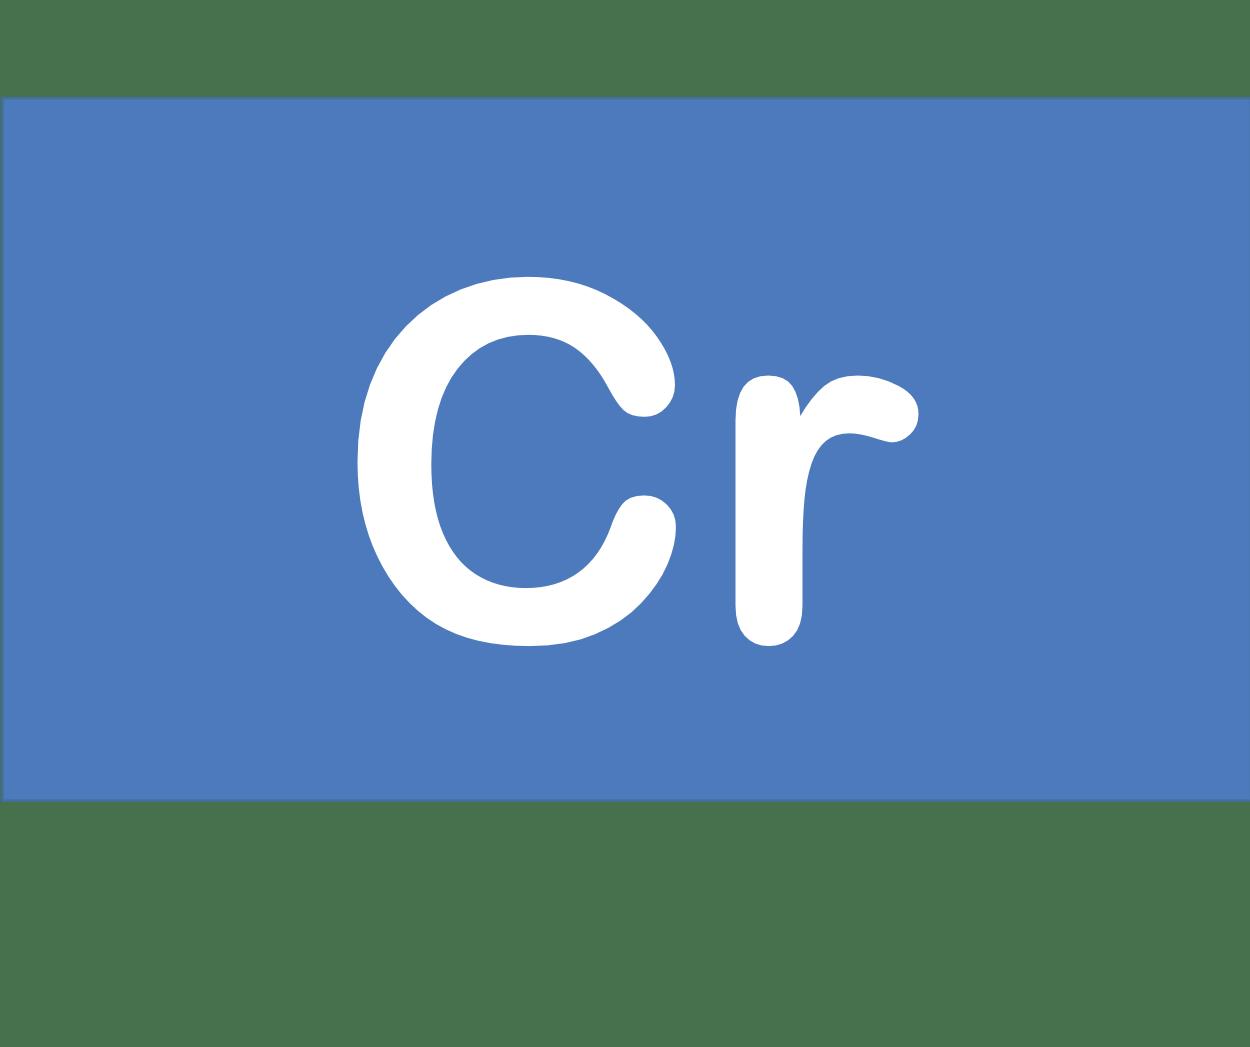 24 Cr クロム Chromium 元素 記号 周期表 化学 原子